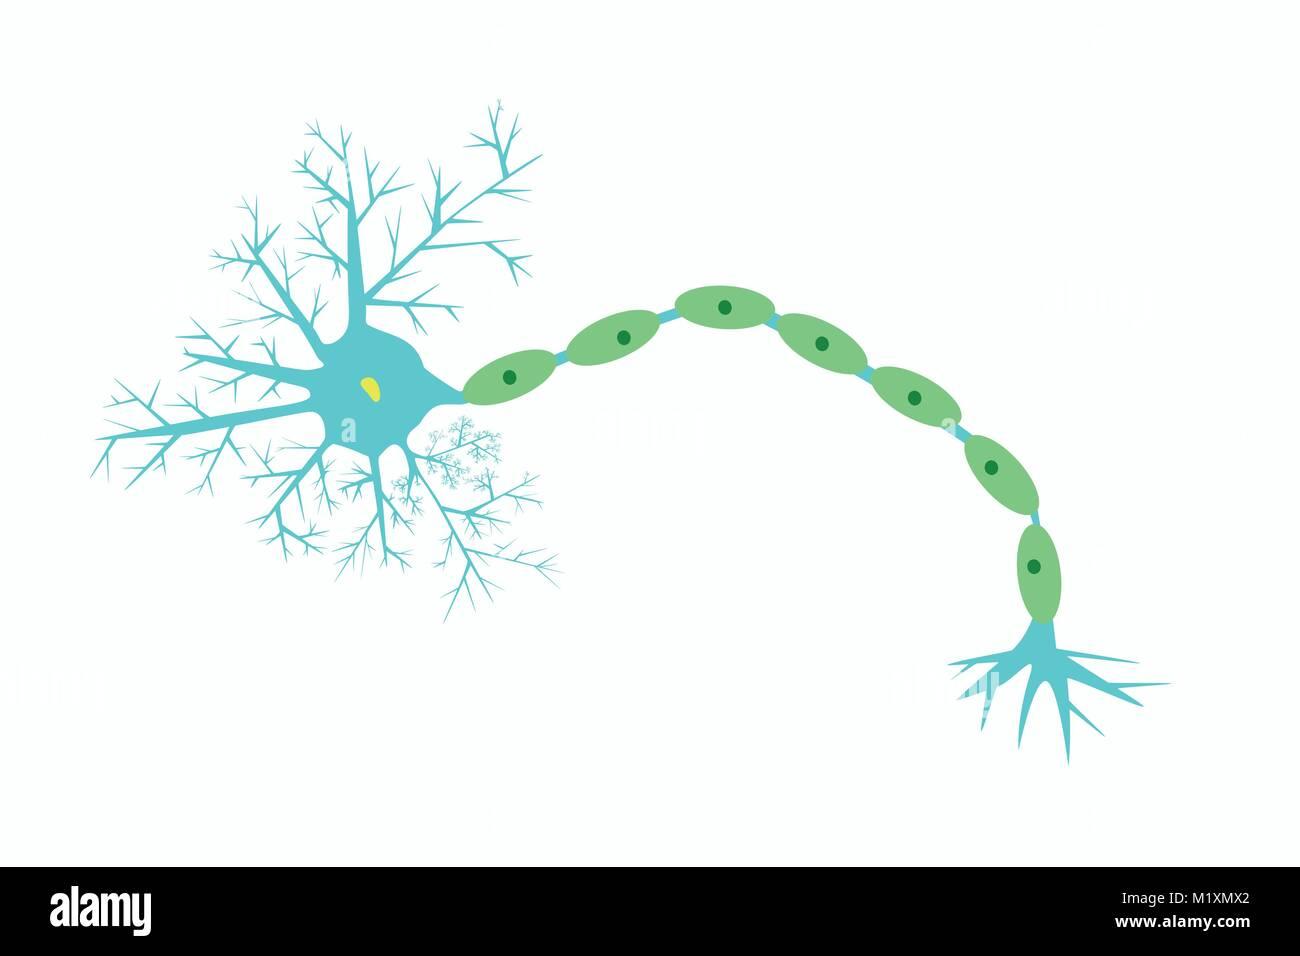 32 Label The Neuron